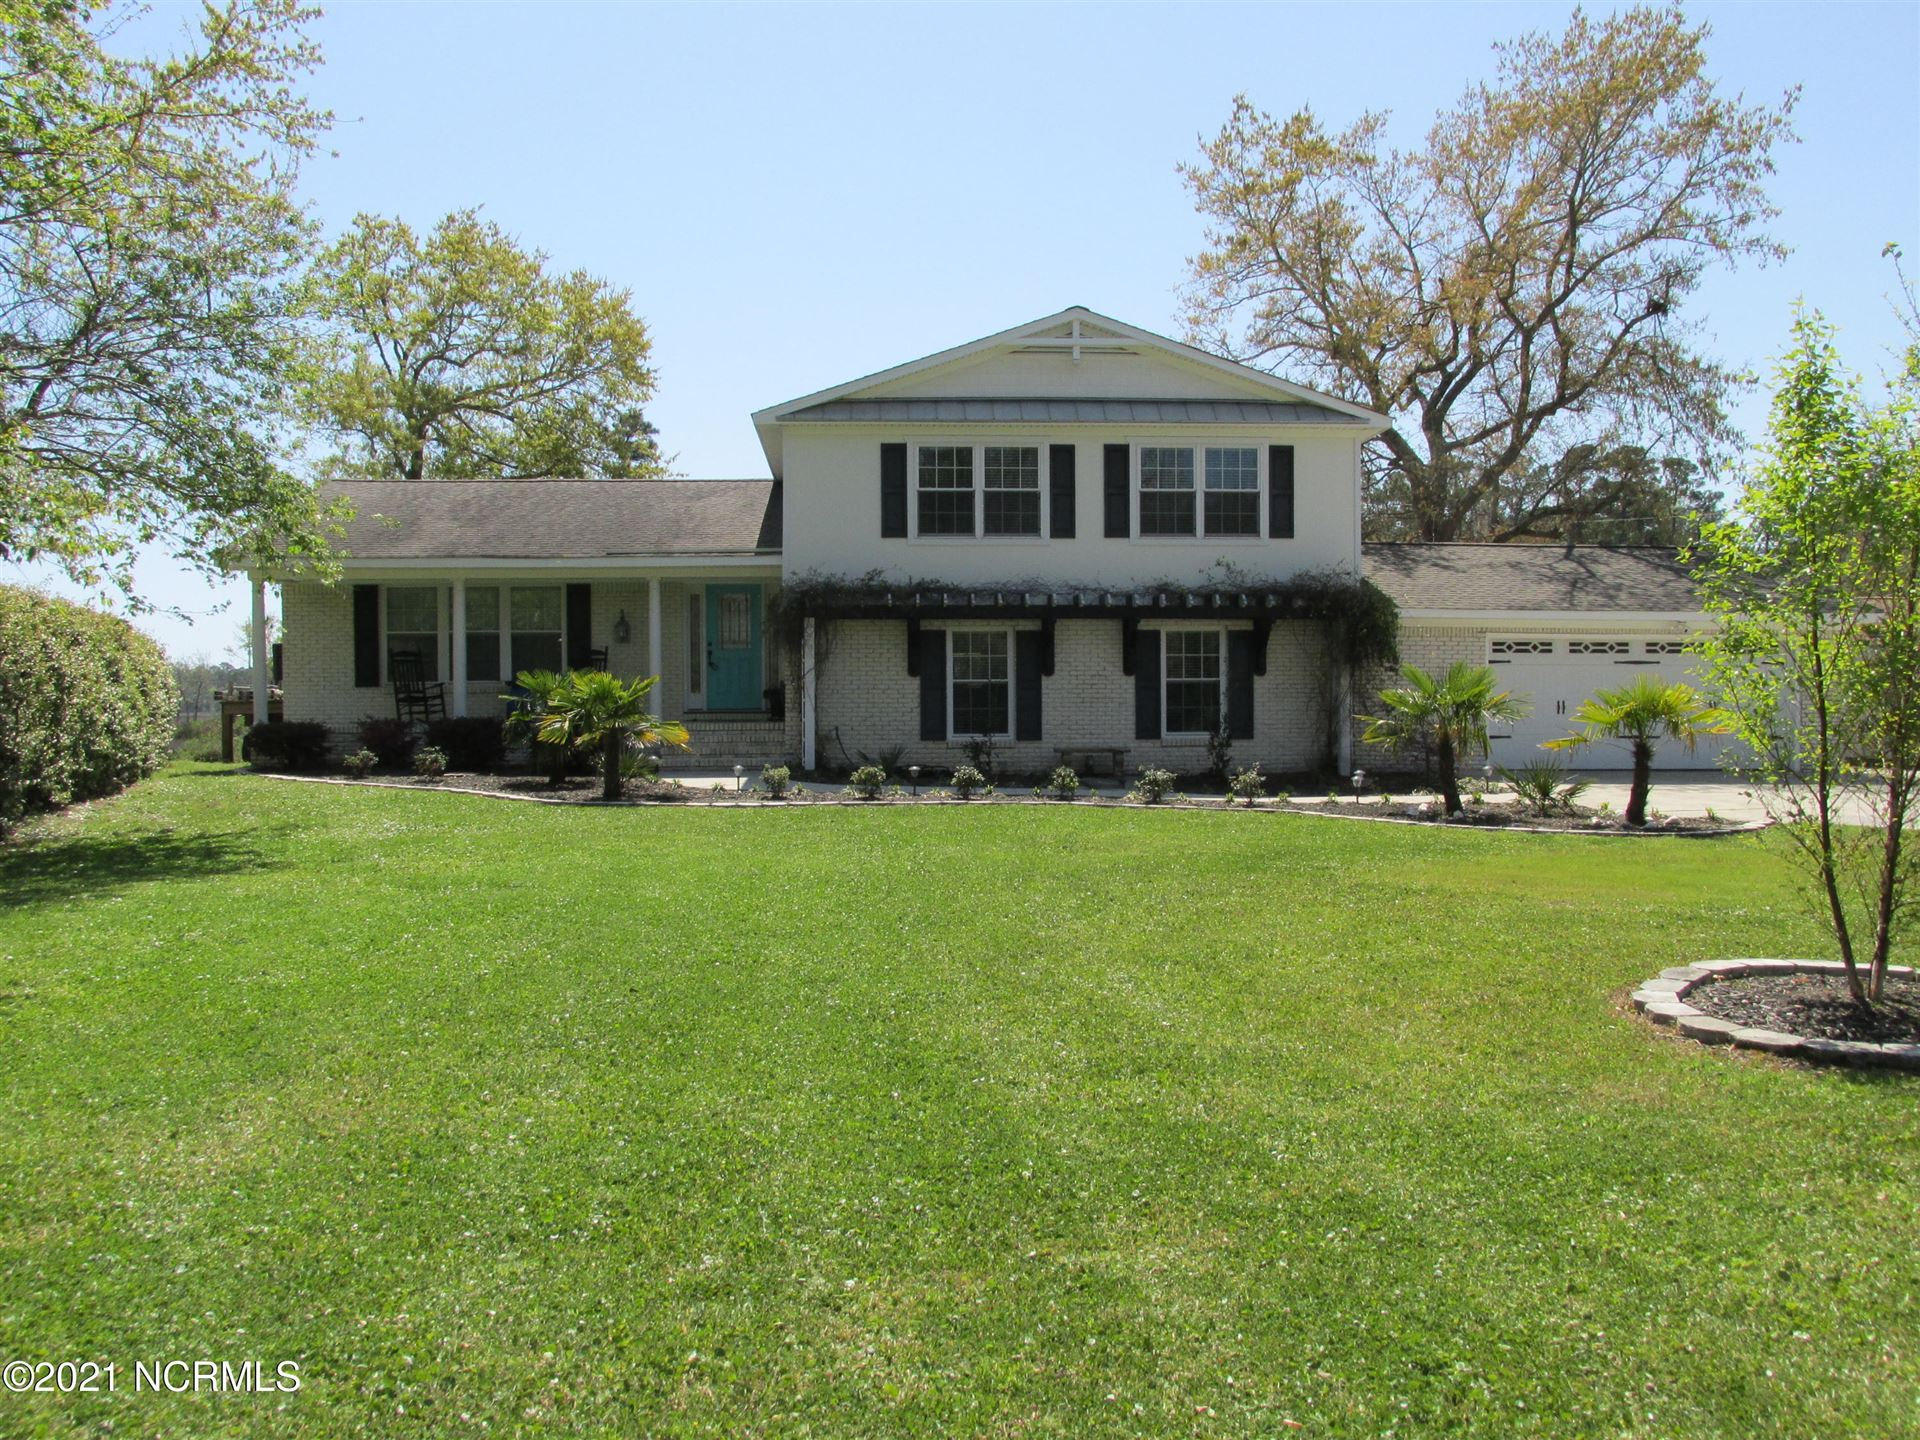 Photo for 632 Bayshore Drive, Wilmington, NC 28411 (MLS # 100264664)